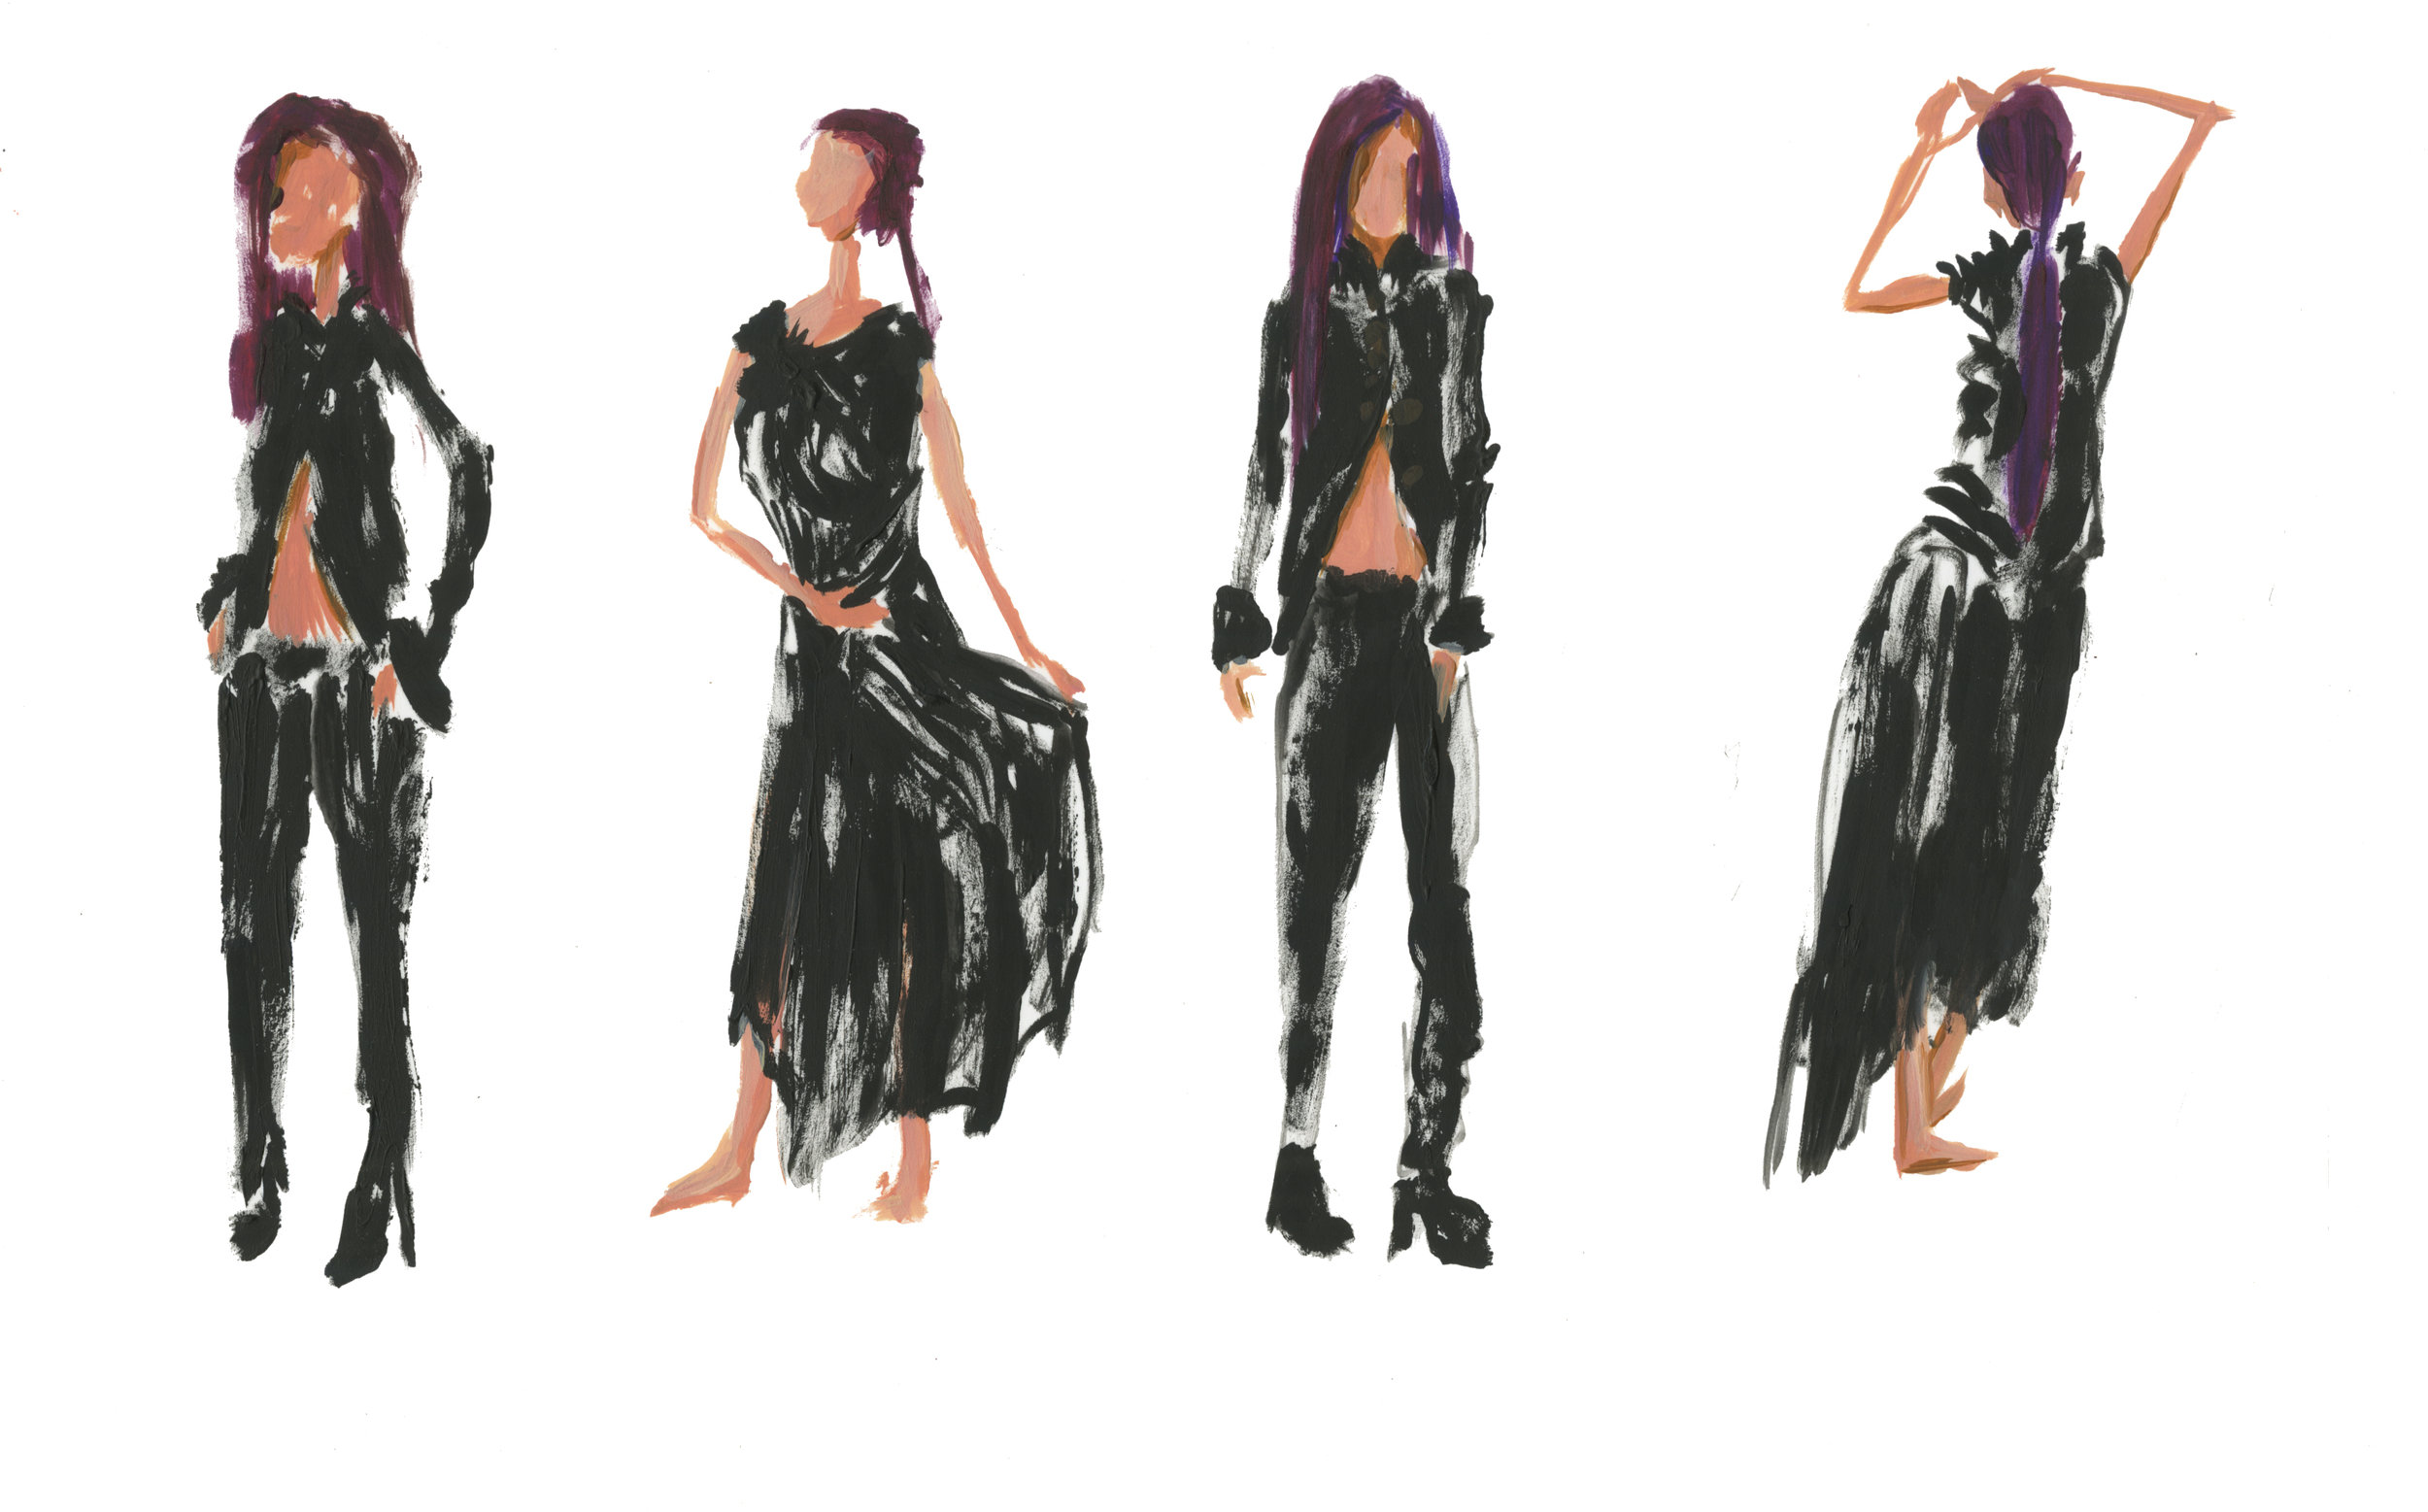 Anderson_FashionIllustration_Acrylic 2.jpg